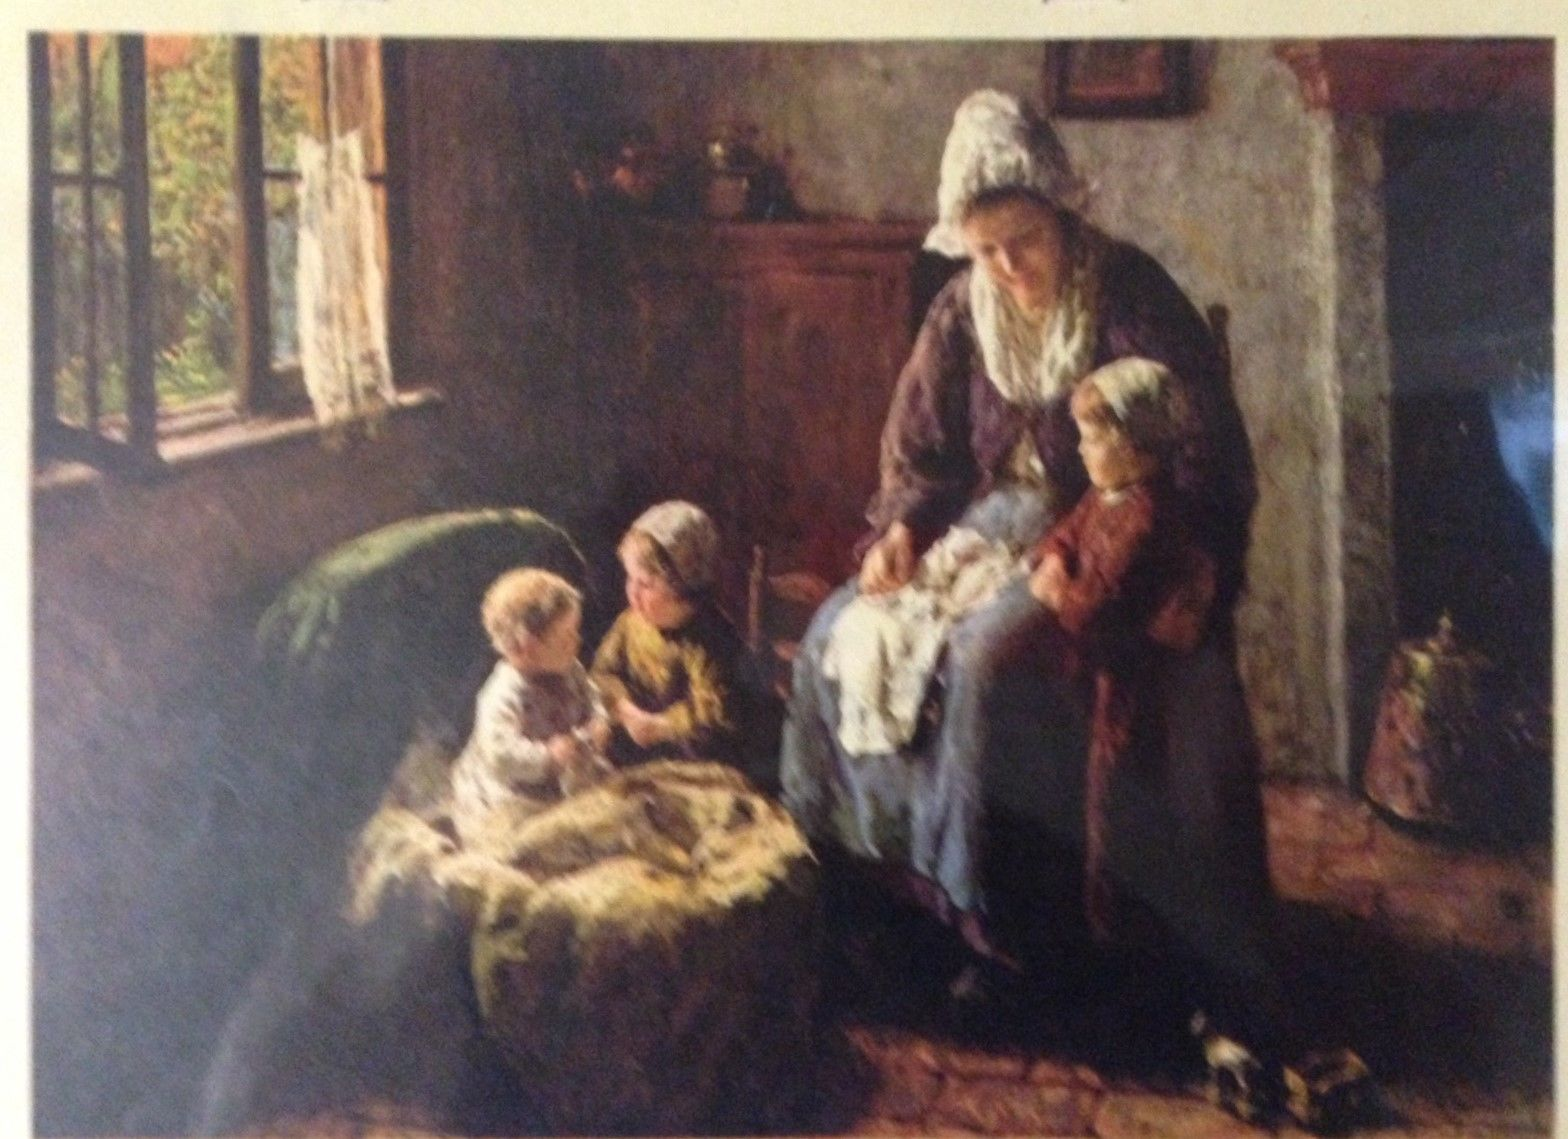 Baby Awake By Bernard Pothast